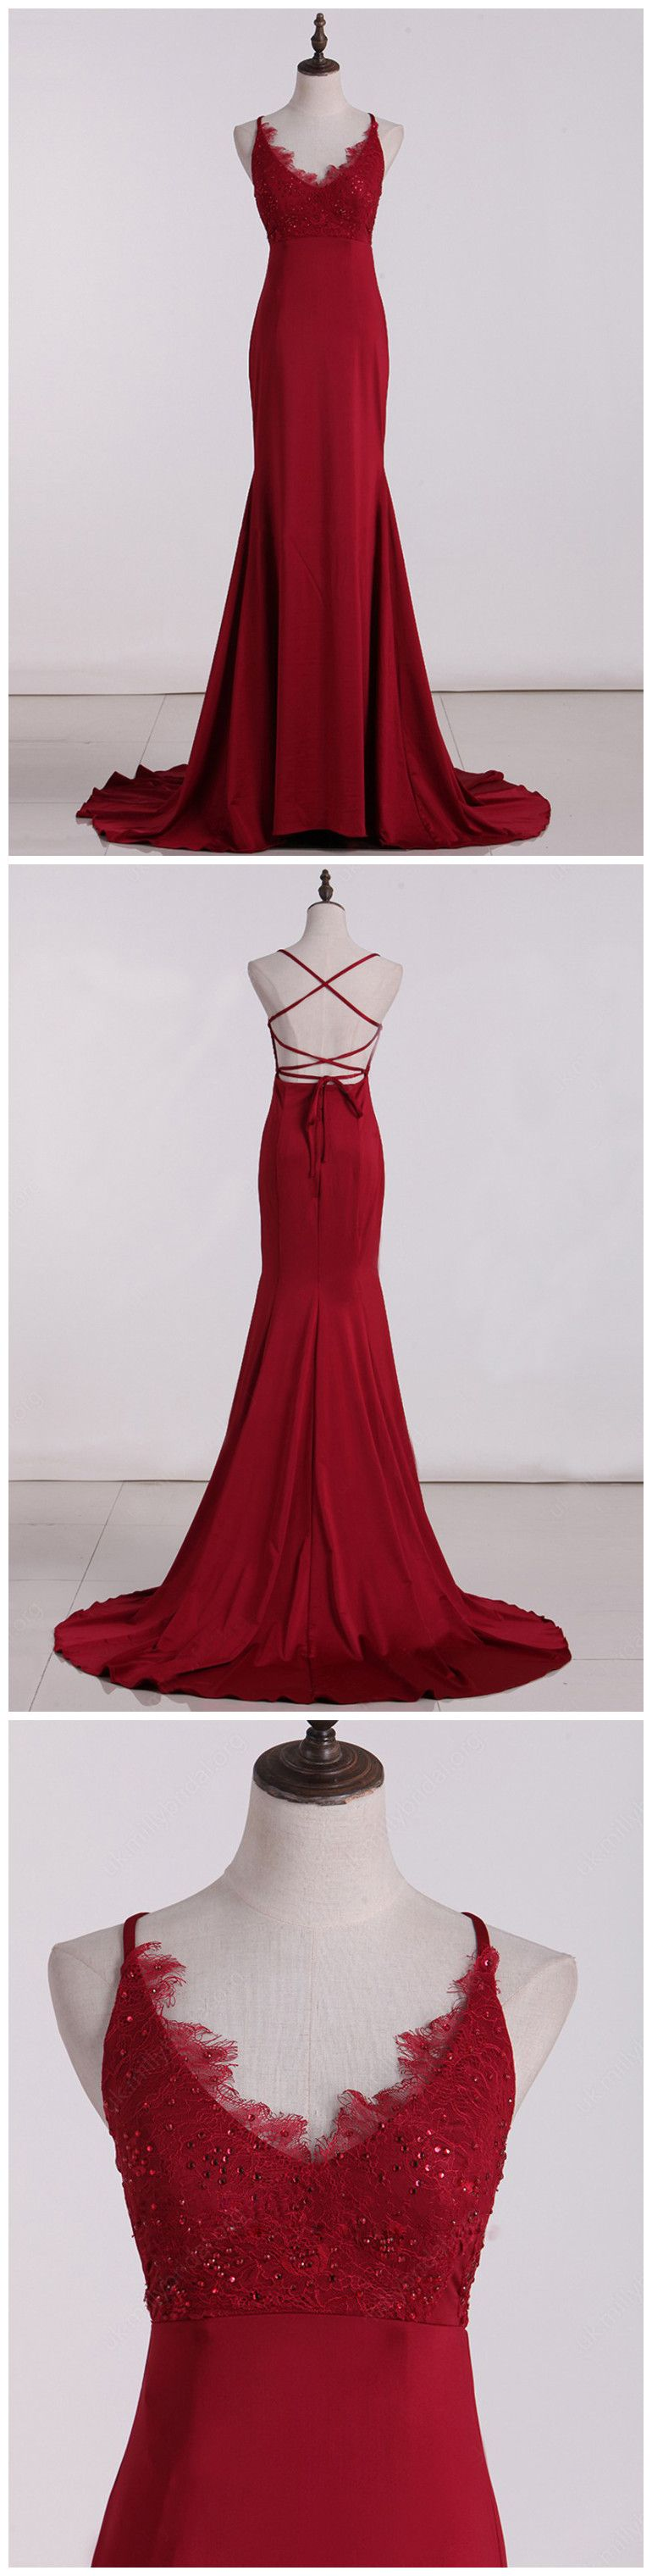 mermaid prom dresses spaghetti straps red prom dress evening